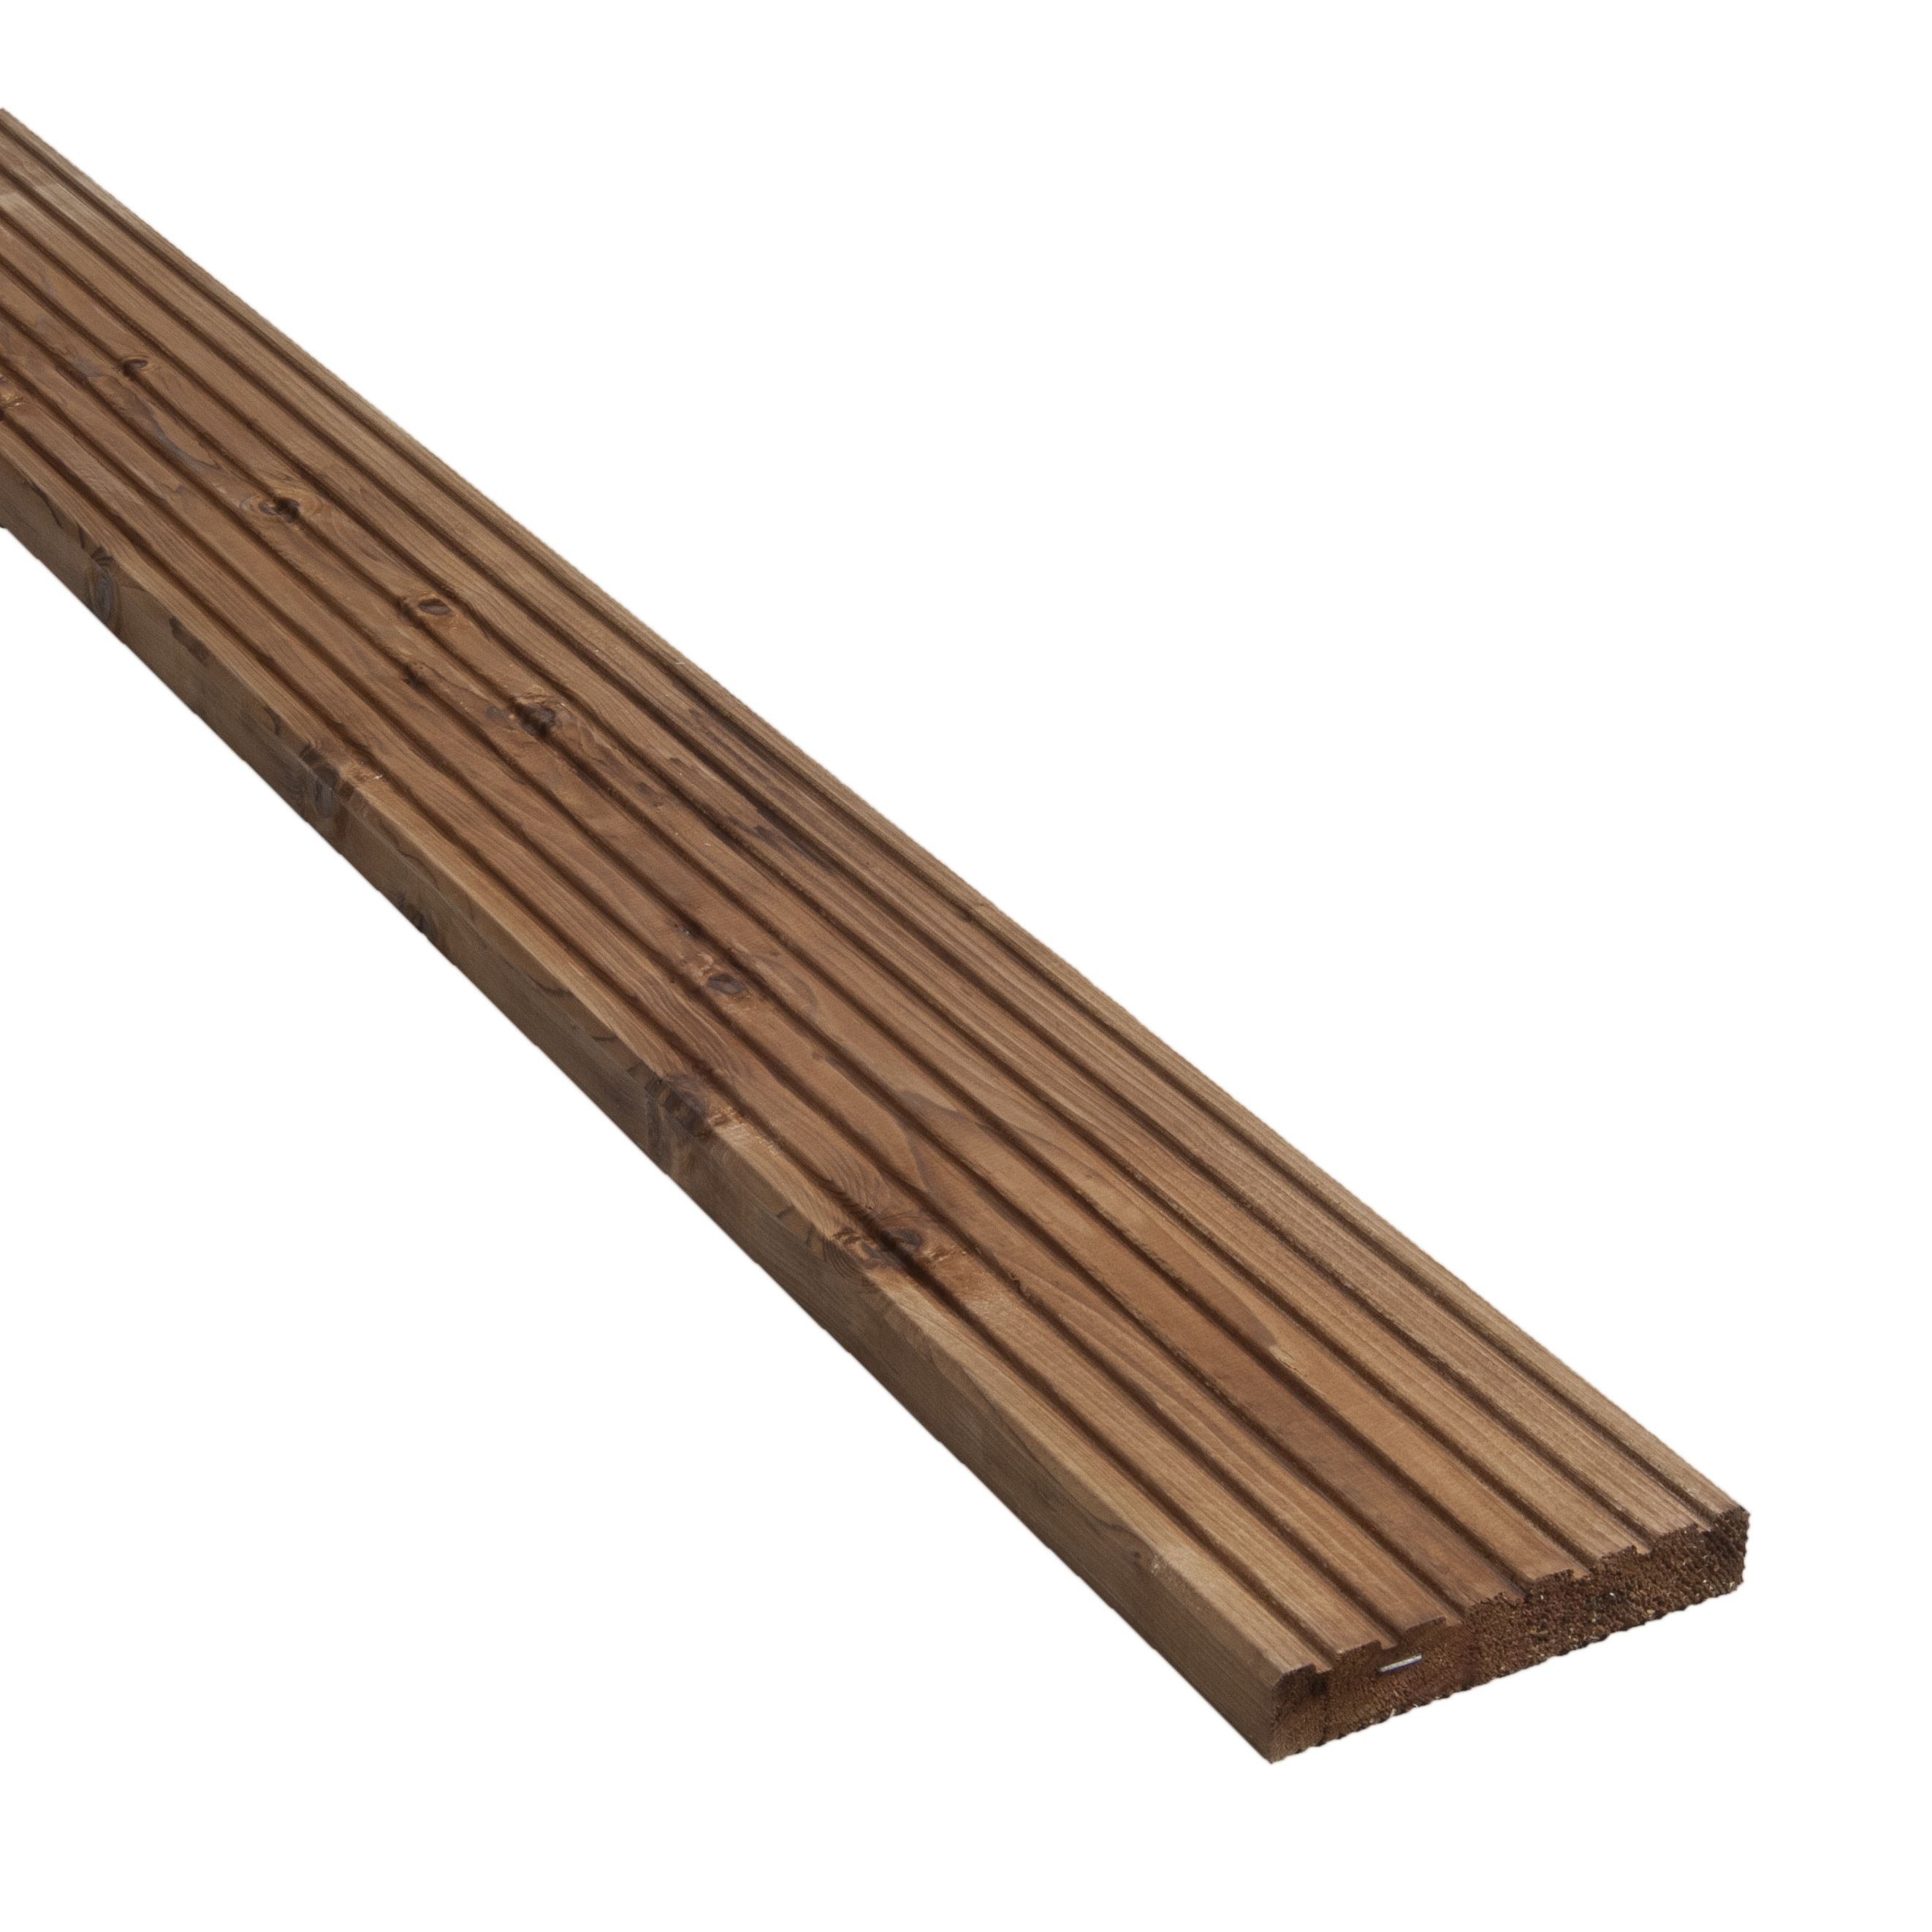 Blooma Nevou Premium Brown Spruce Deck Board (t)27mm (w)144mm (l)2400mm